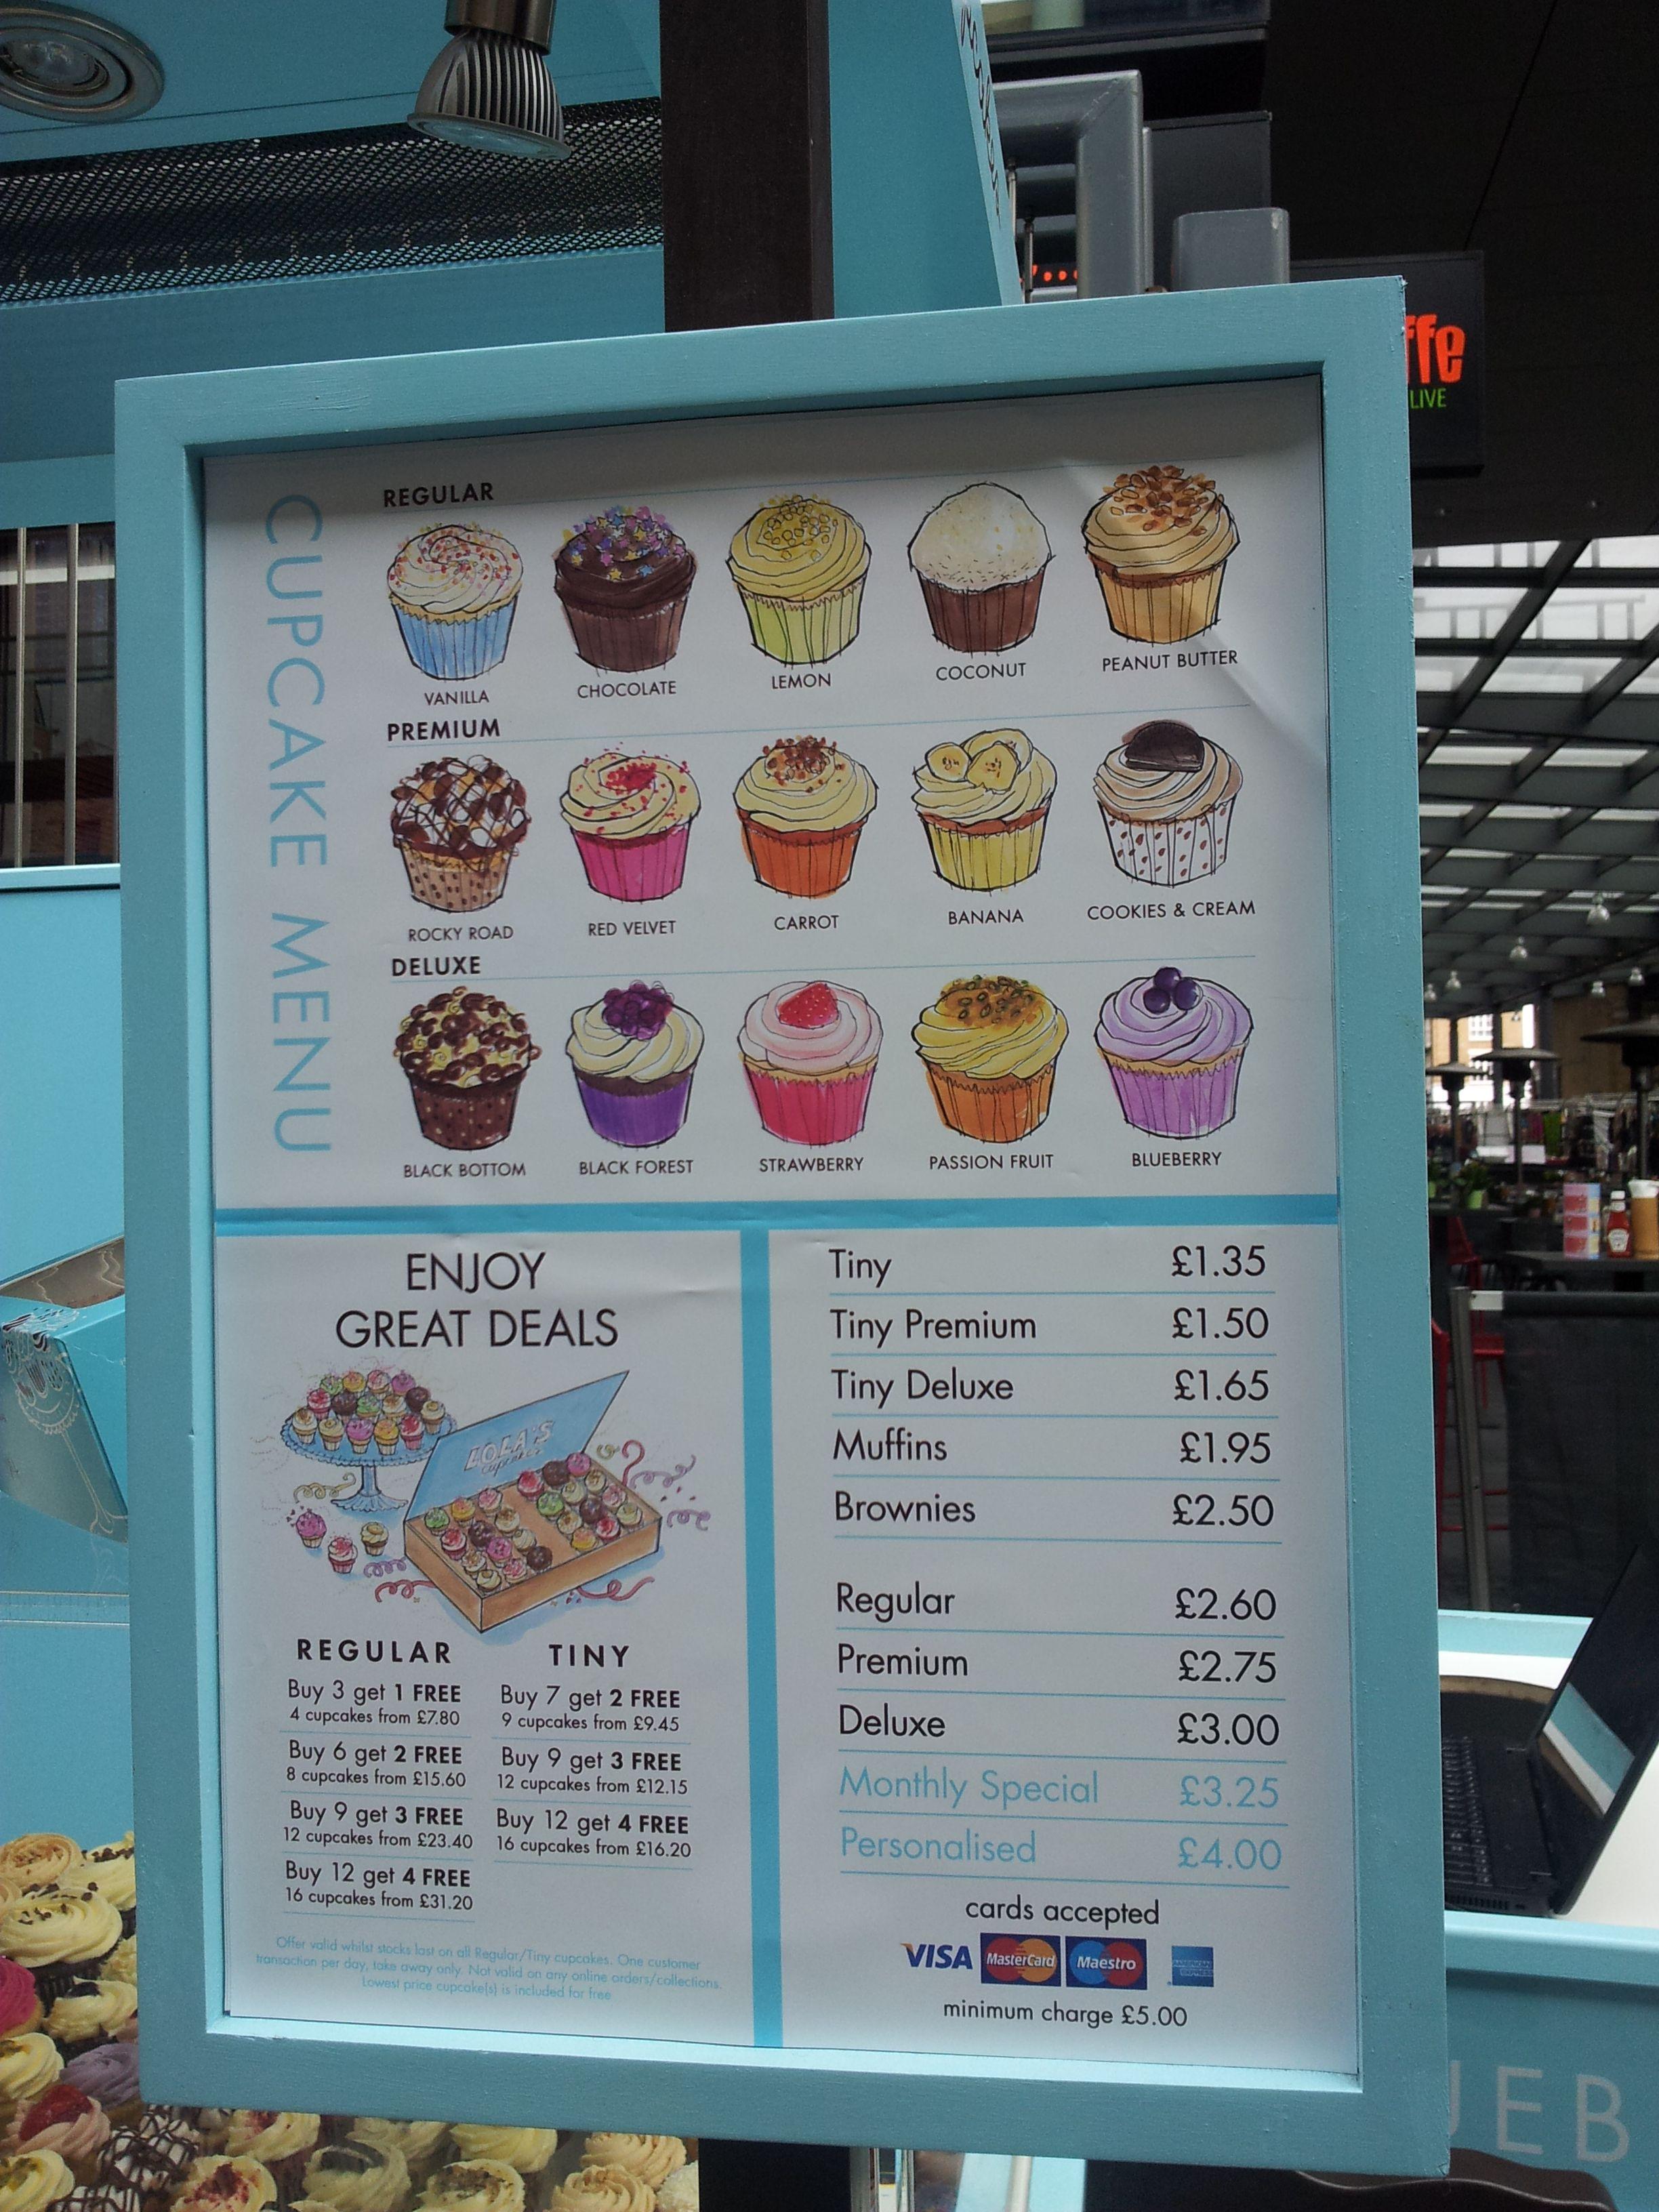 Cute Menu Idea Keep Choices To A Minimum So Customers Are Not